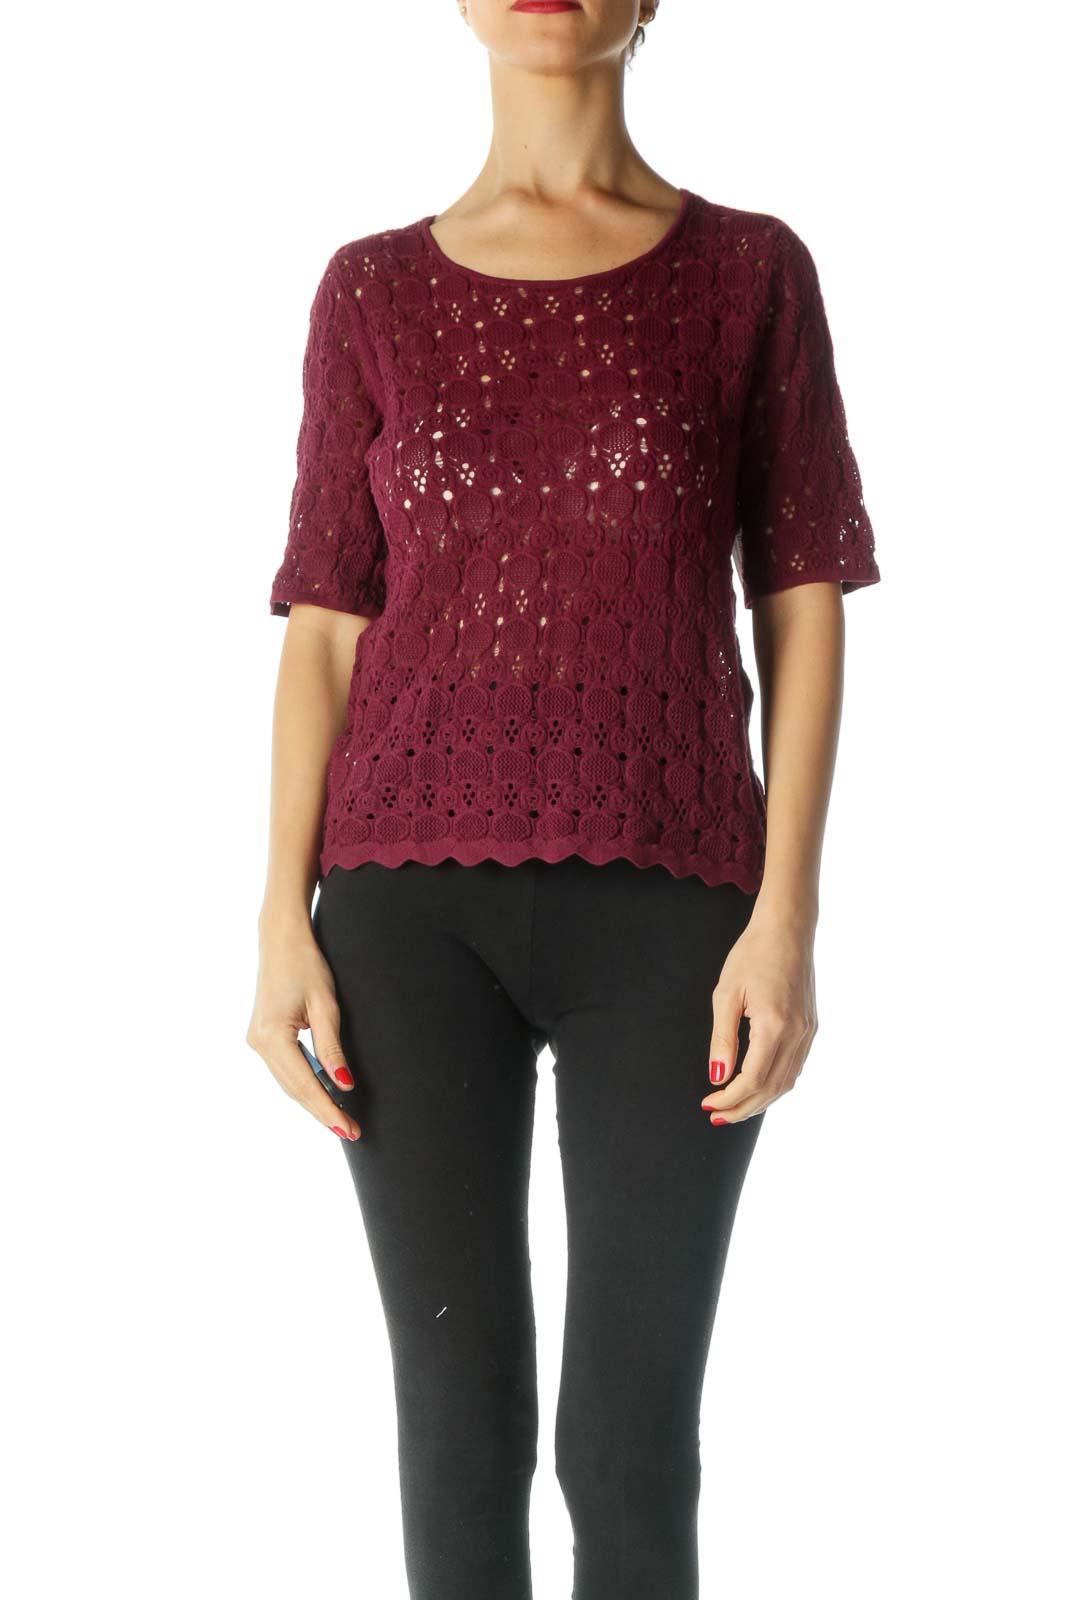 Burgundy Round Neck Short Sleeve Knit Top